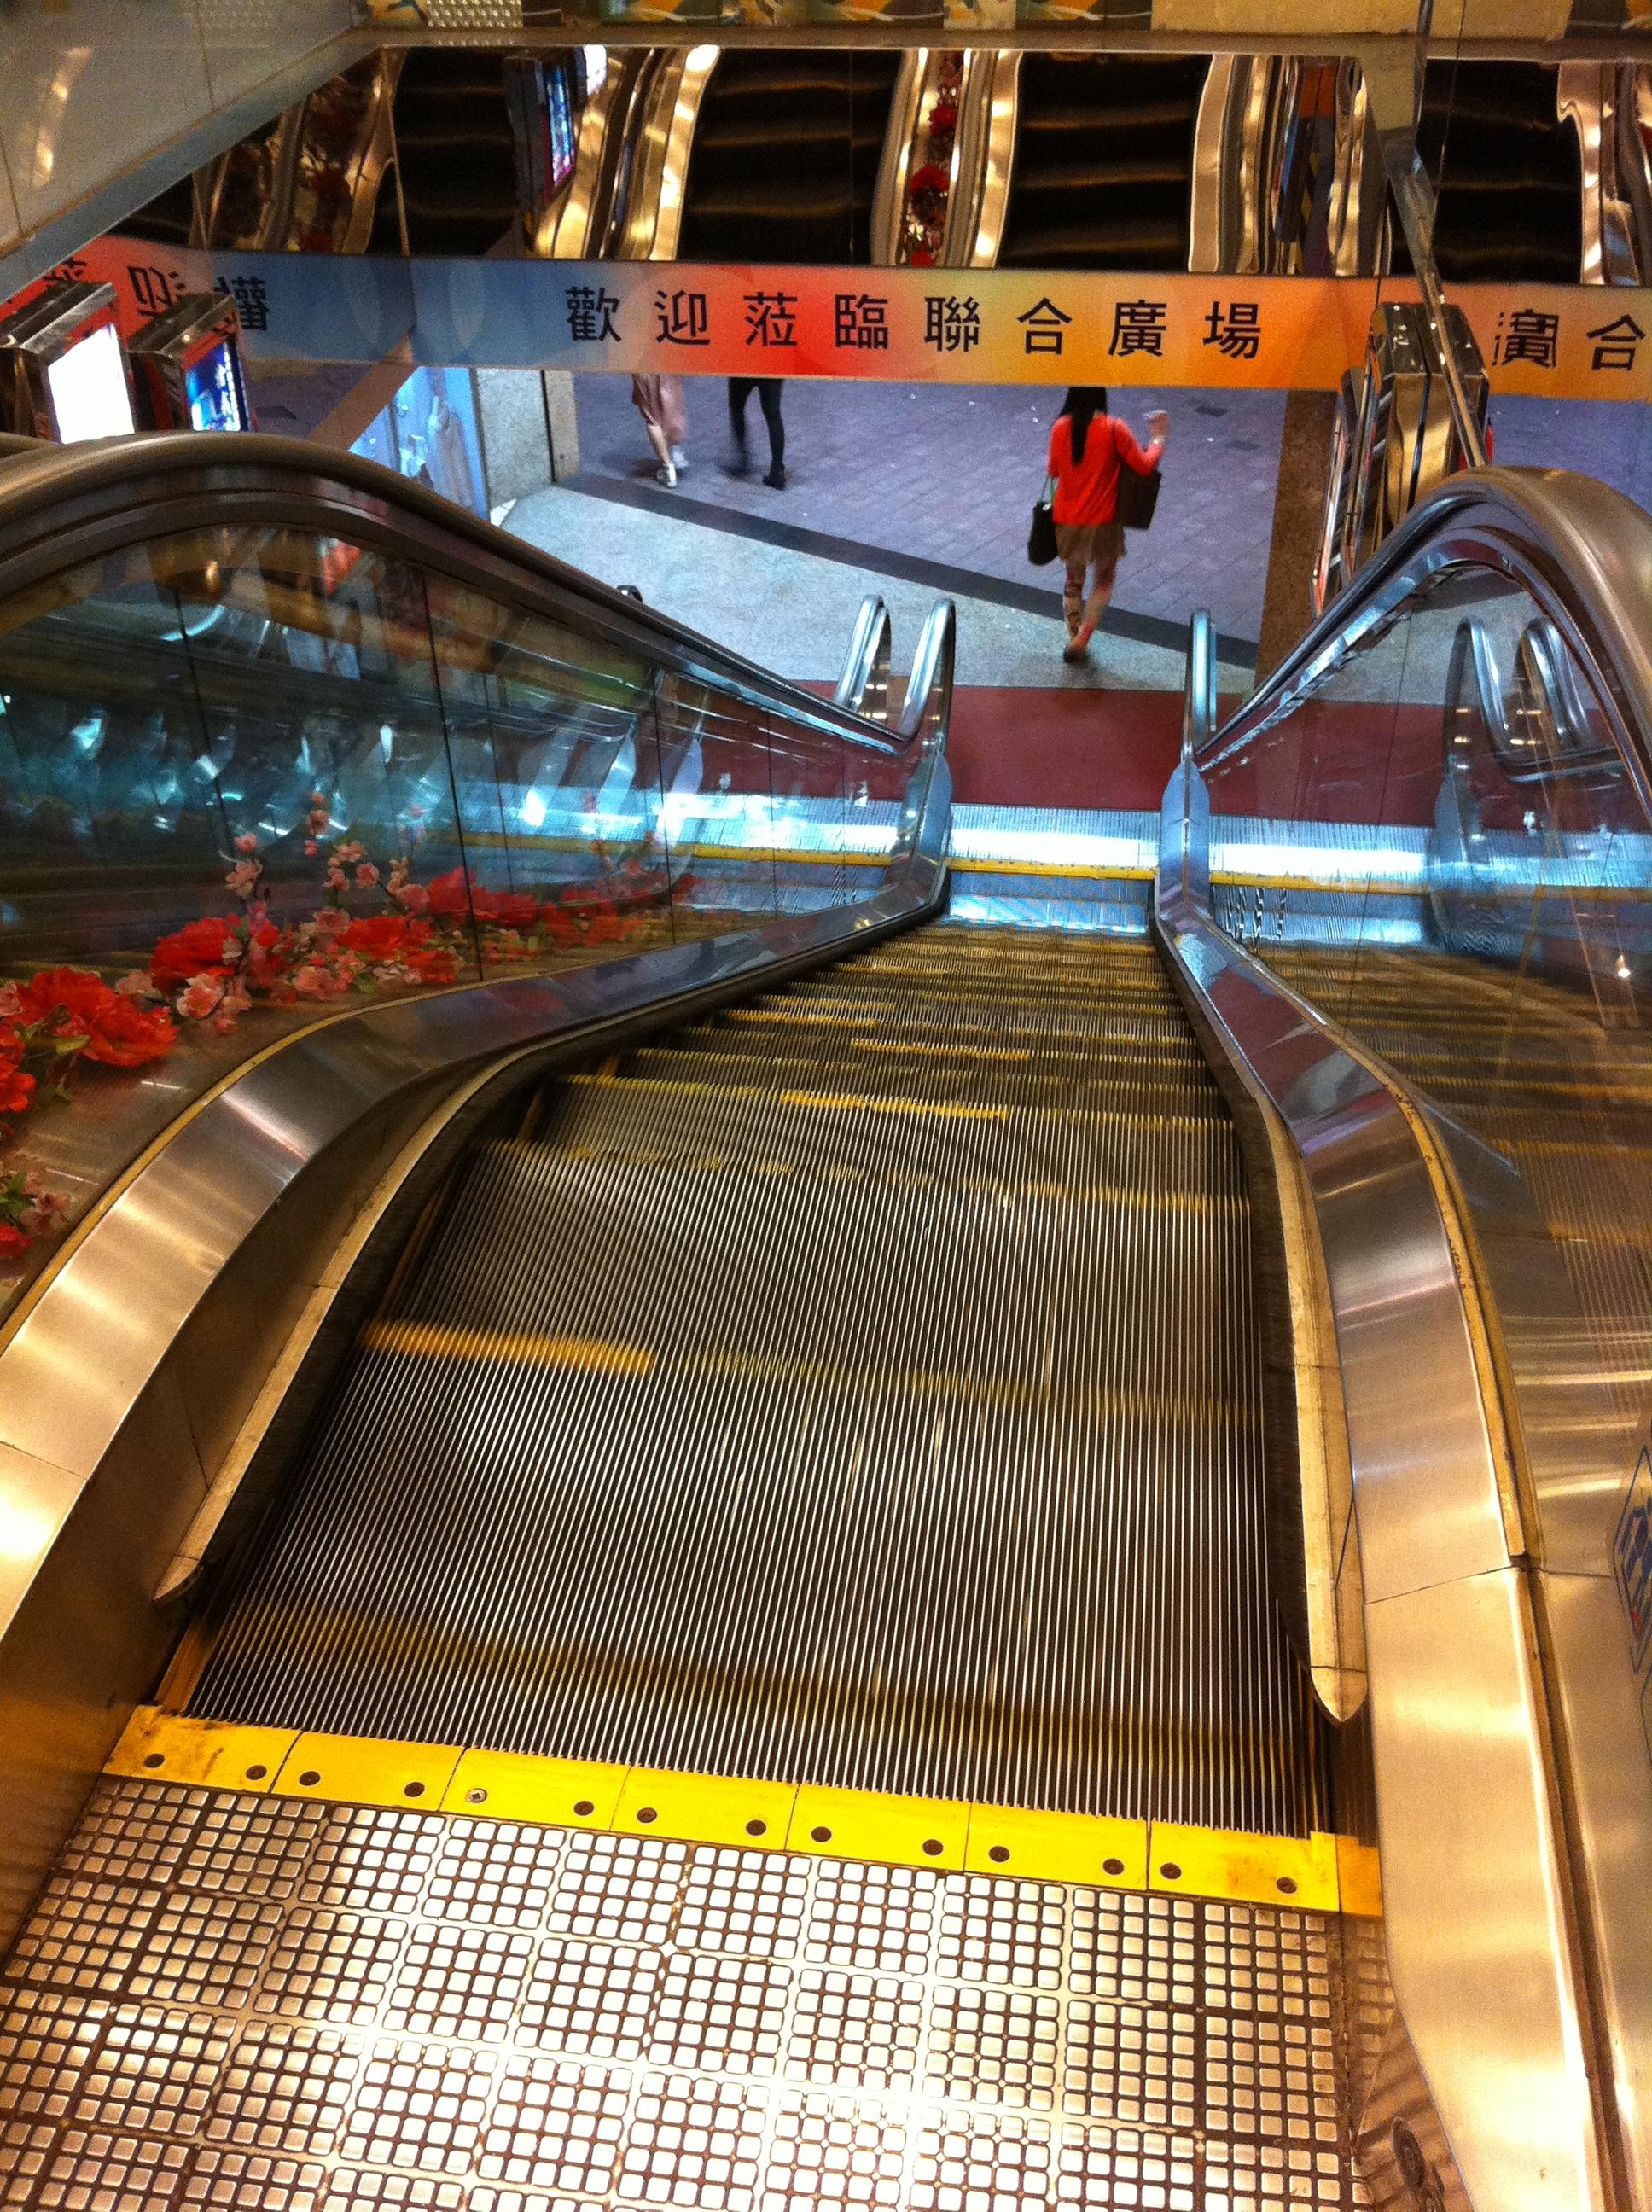 Stainless Steel Escalators : File hk mongkok 聯合廣場 allied plaza night mall goldstar